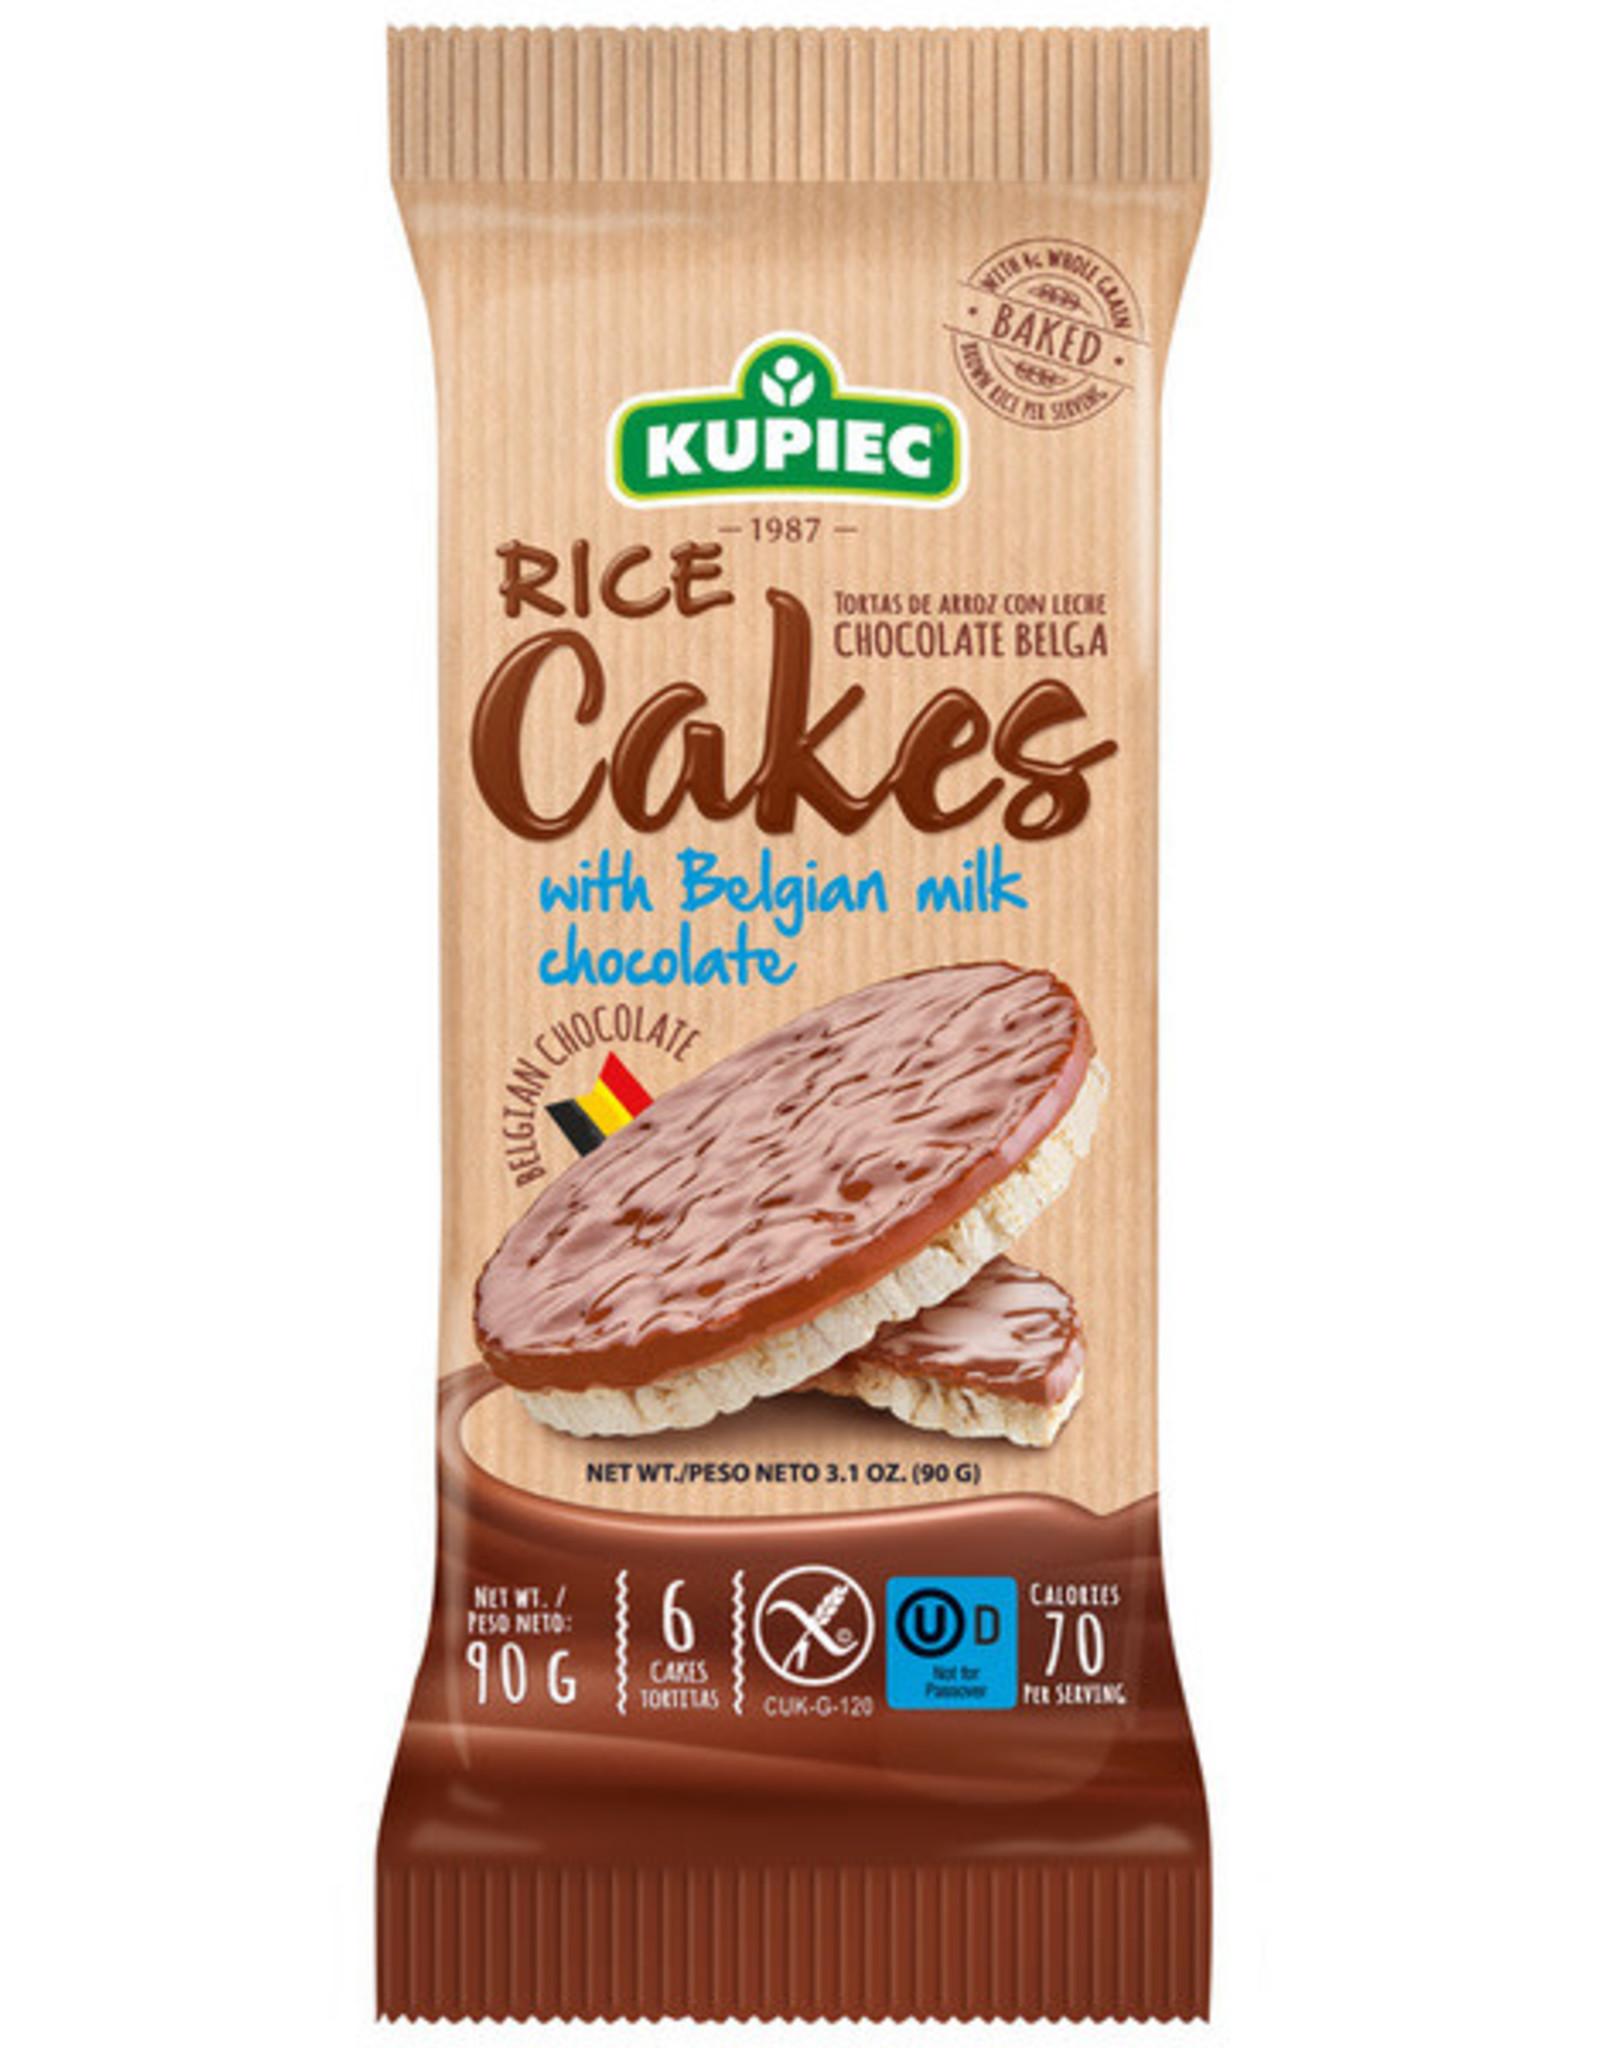 Kupiec Rice Cakes with Milk Chocolate - Gluten Free - 90g